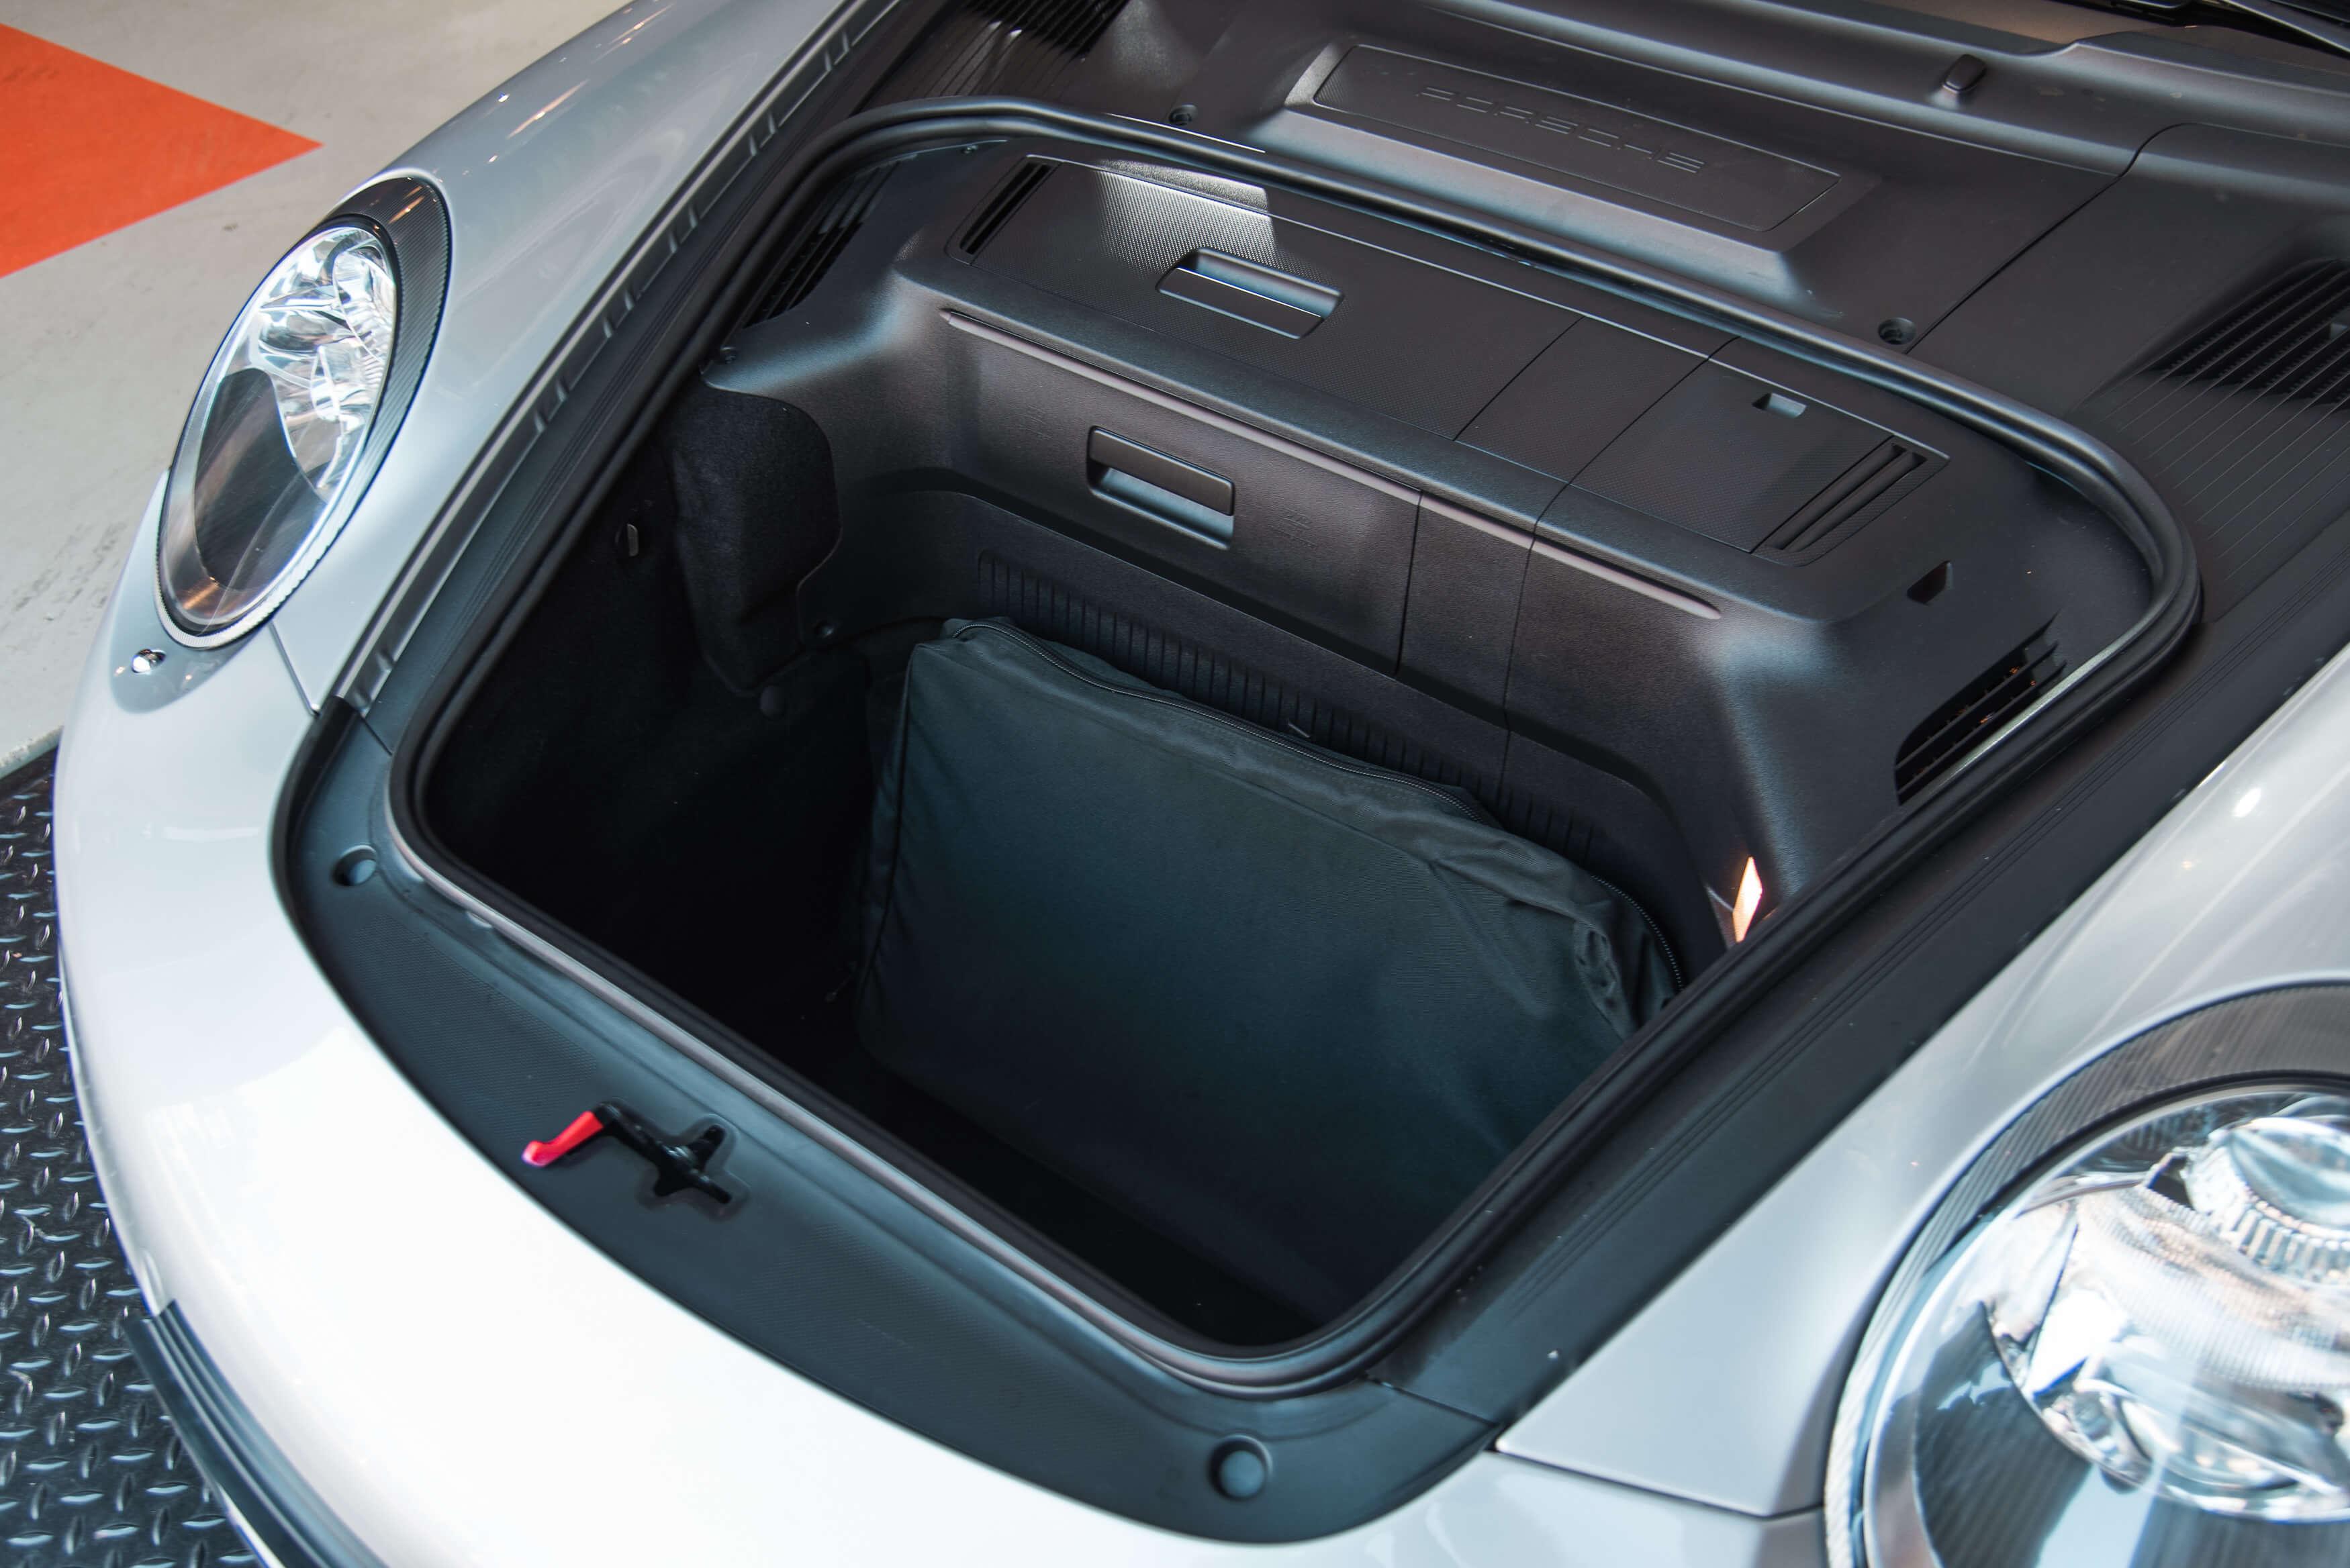 Porsche 997 Carrera 2 automaat Car Service Visser gespecialiseerd in Porsche - 10